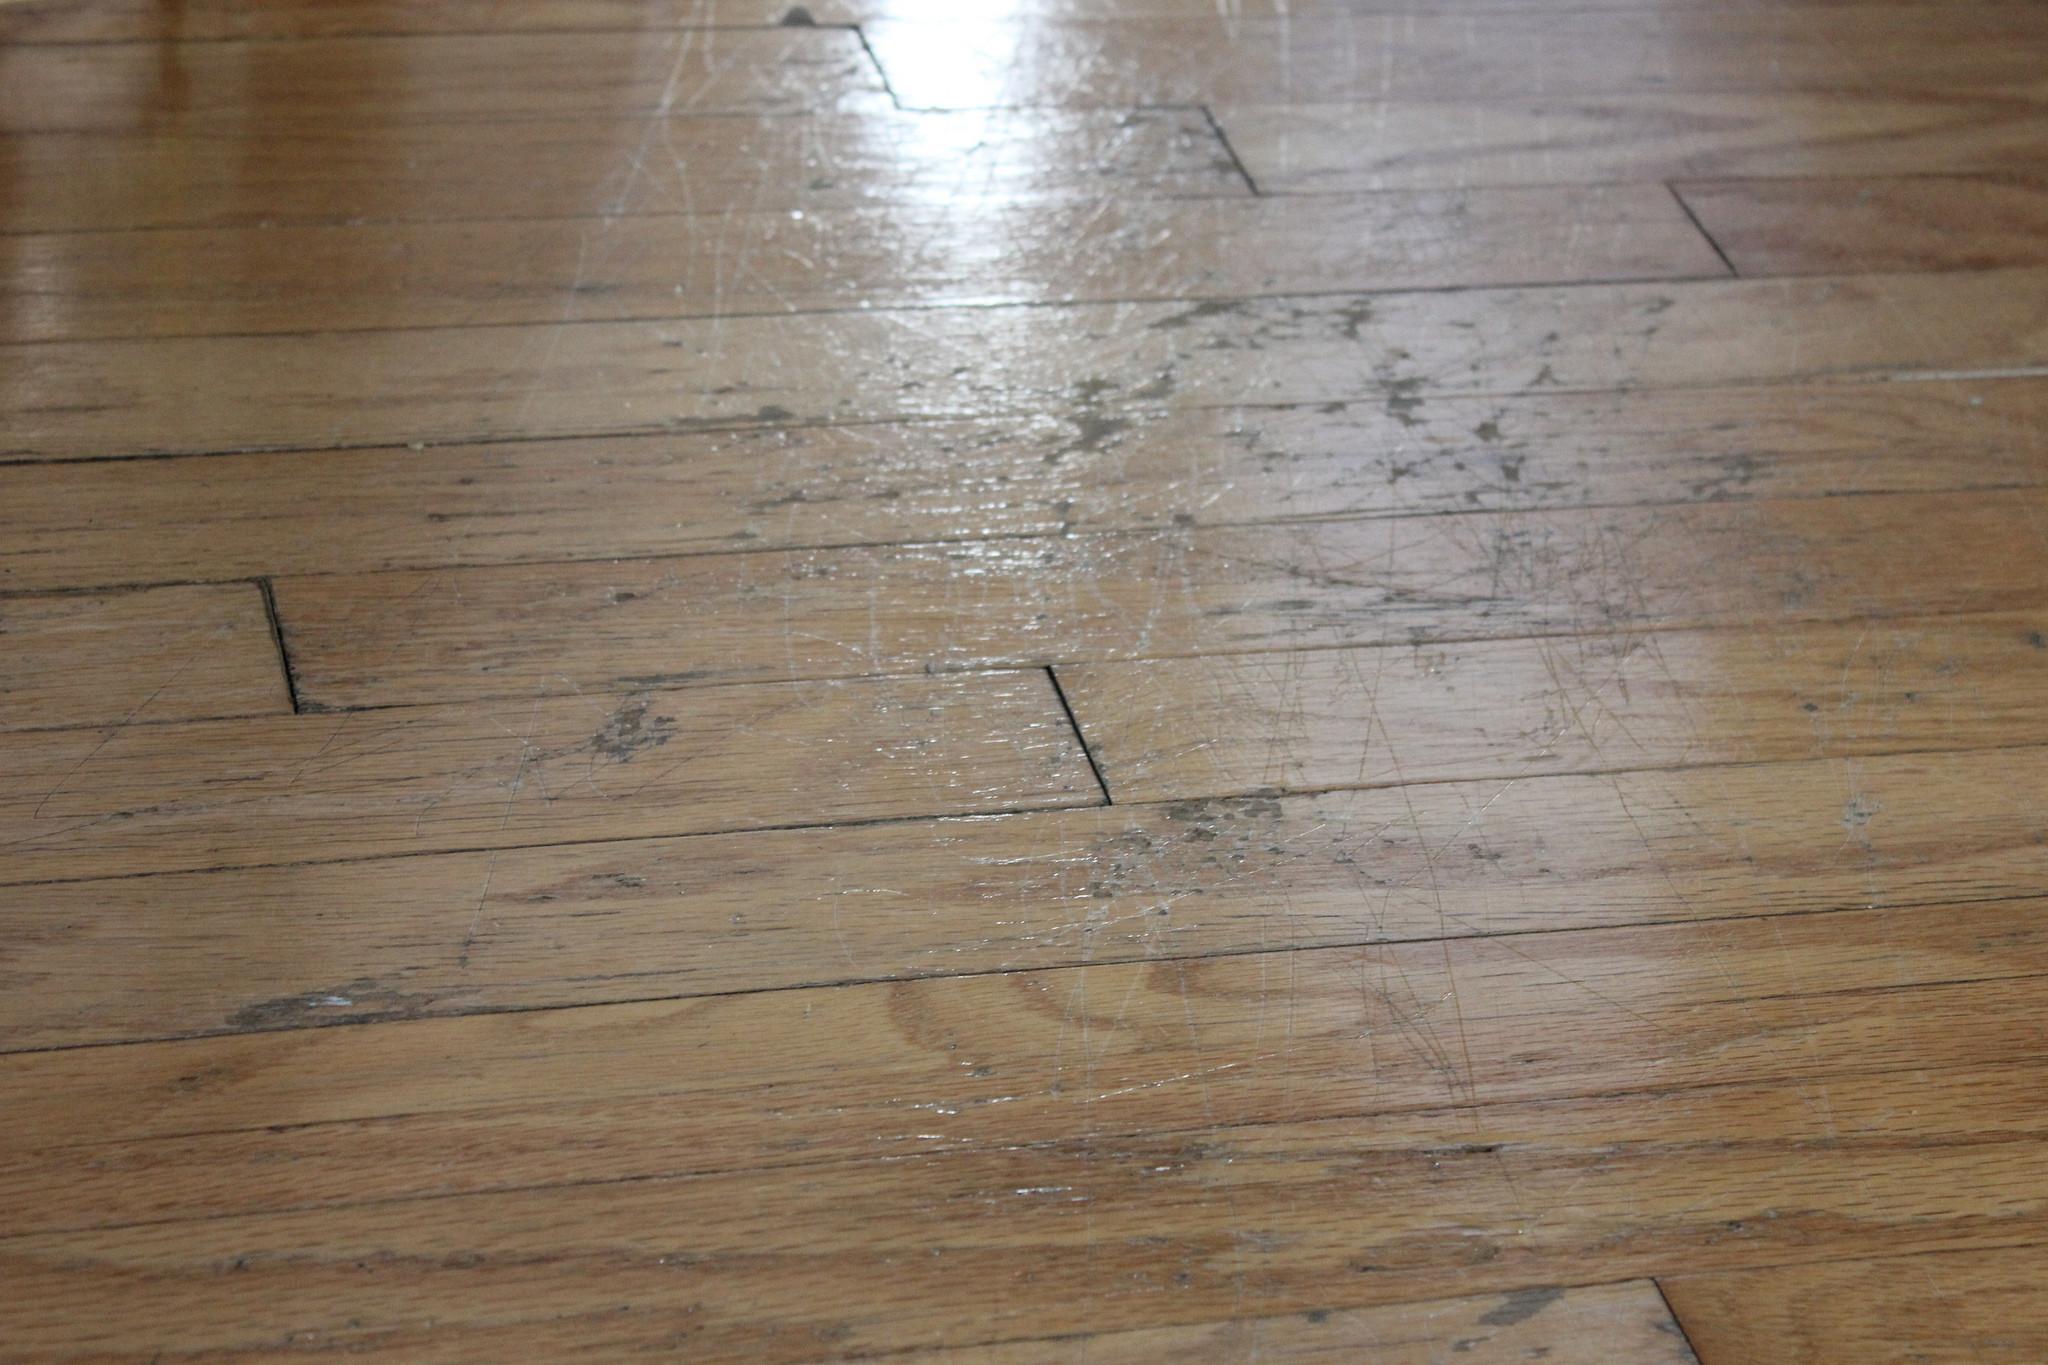 hardwood floor varnish of diy experiment a quick fix for scratched hardwood floors money within 15624328214 3c7ba6f6ff k